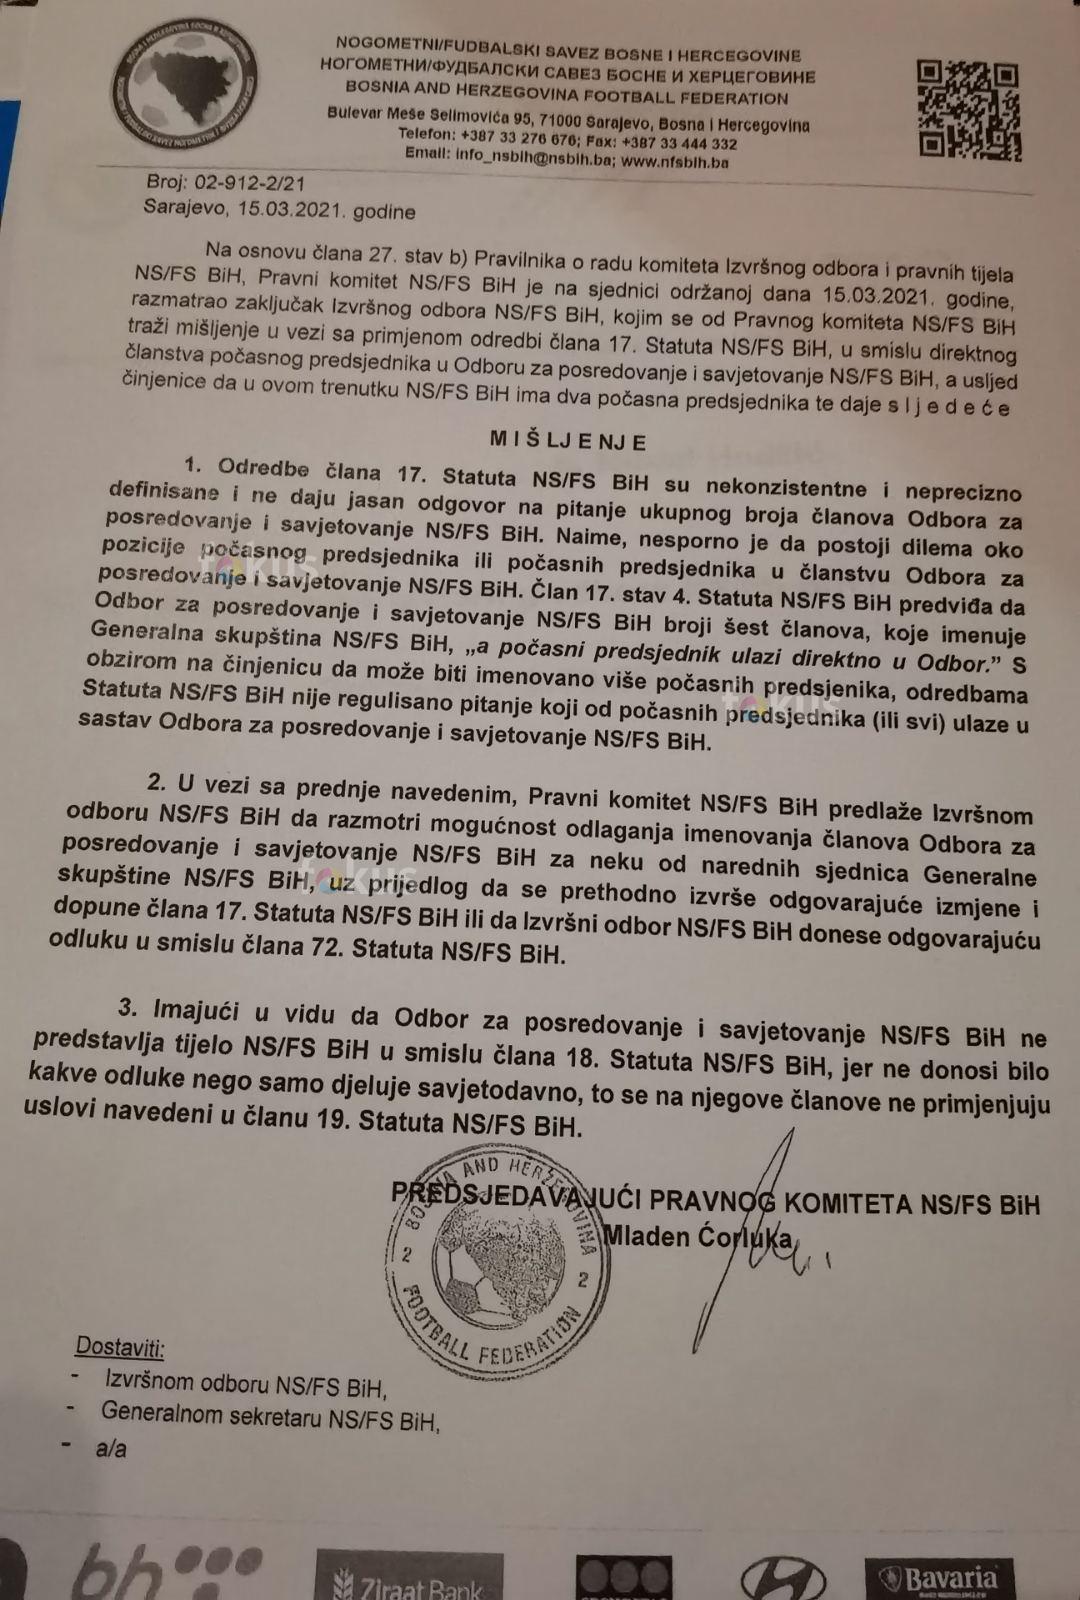 Faksimil odluke Pravnog komiteta NSBiH (FOTO: Fokus.ba)